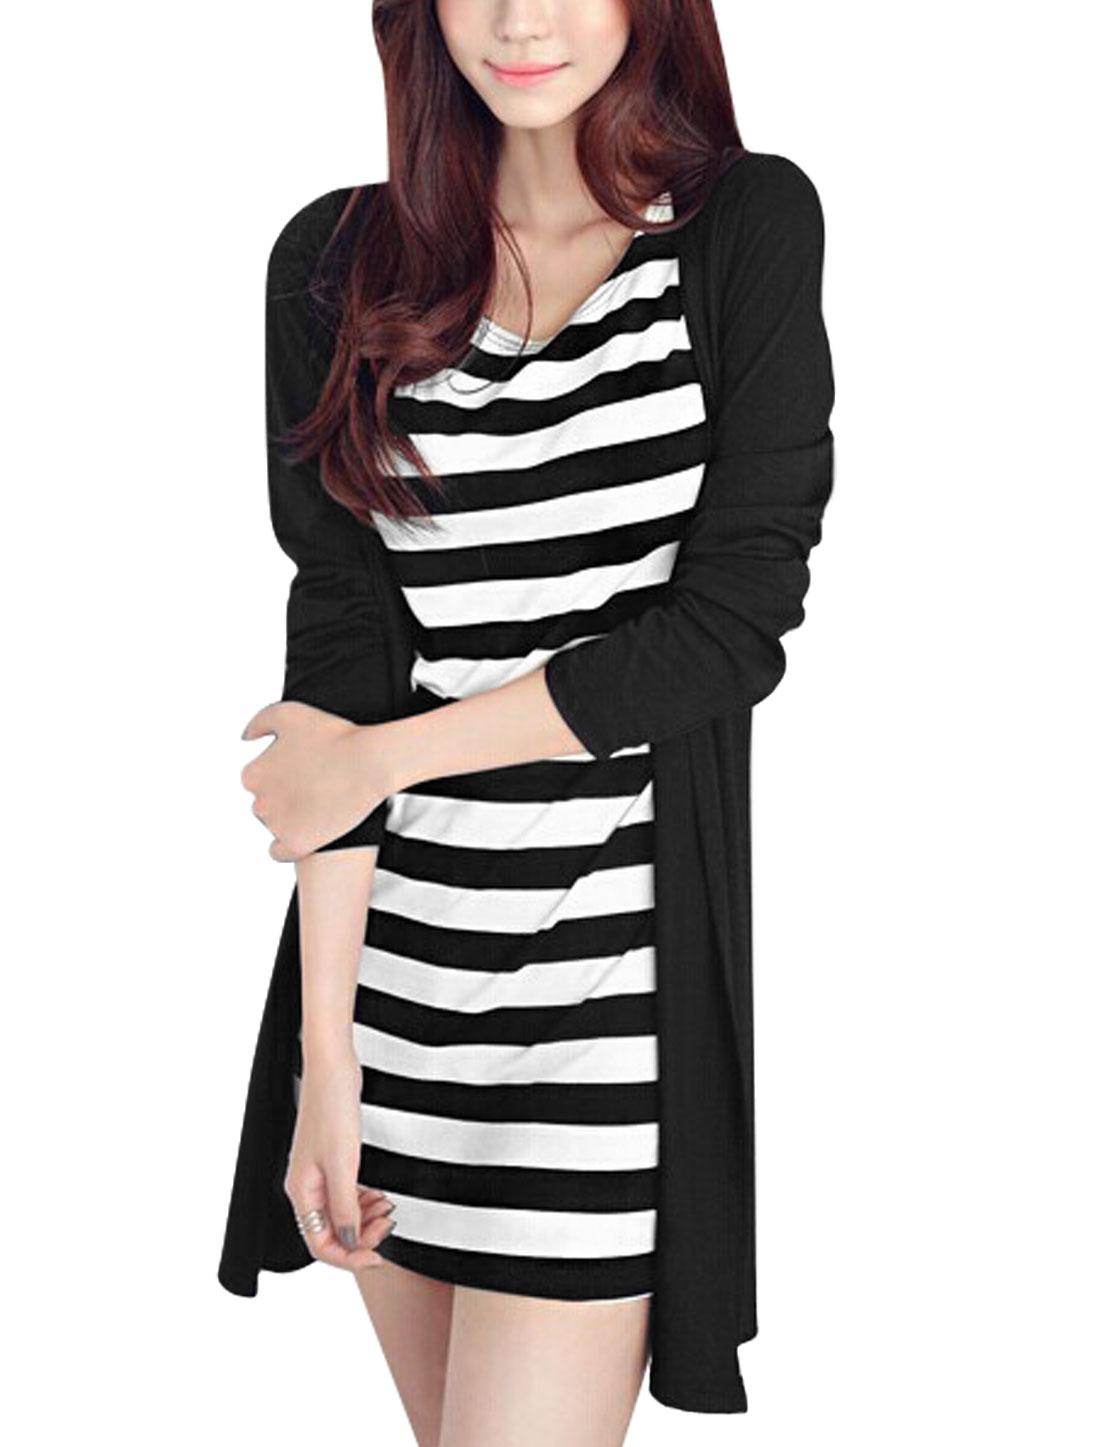 Women Round Neck Long Sleeves Layered Design Casual Dress Black XS